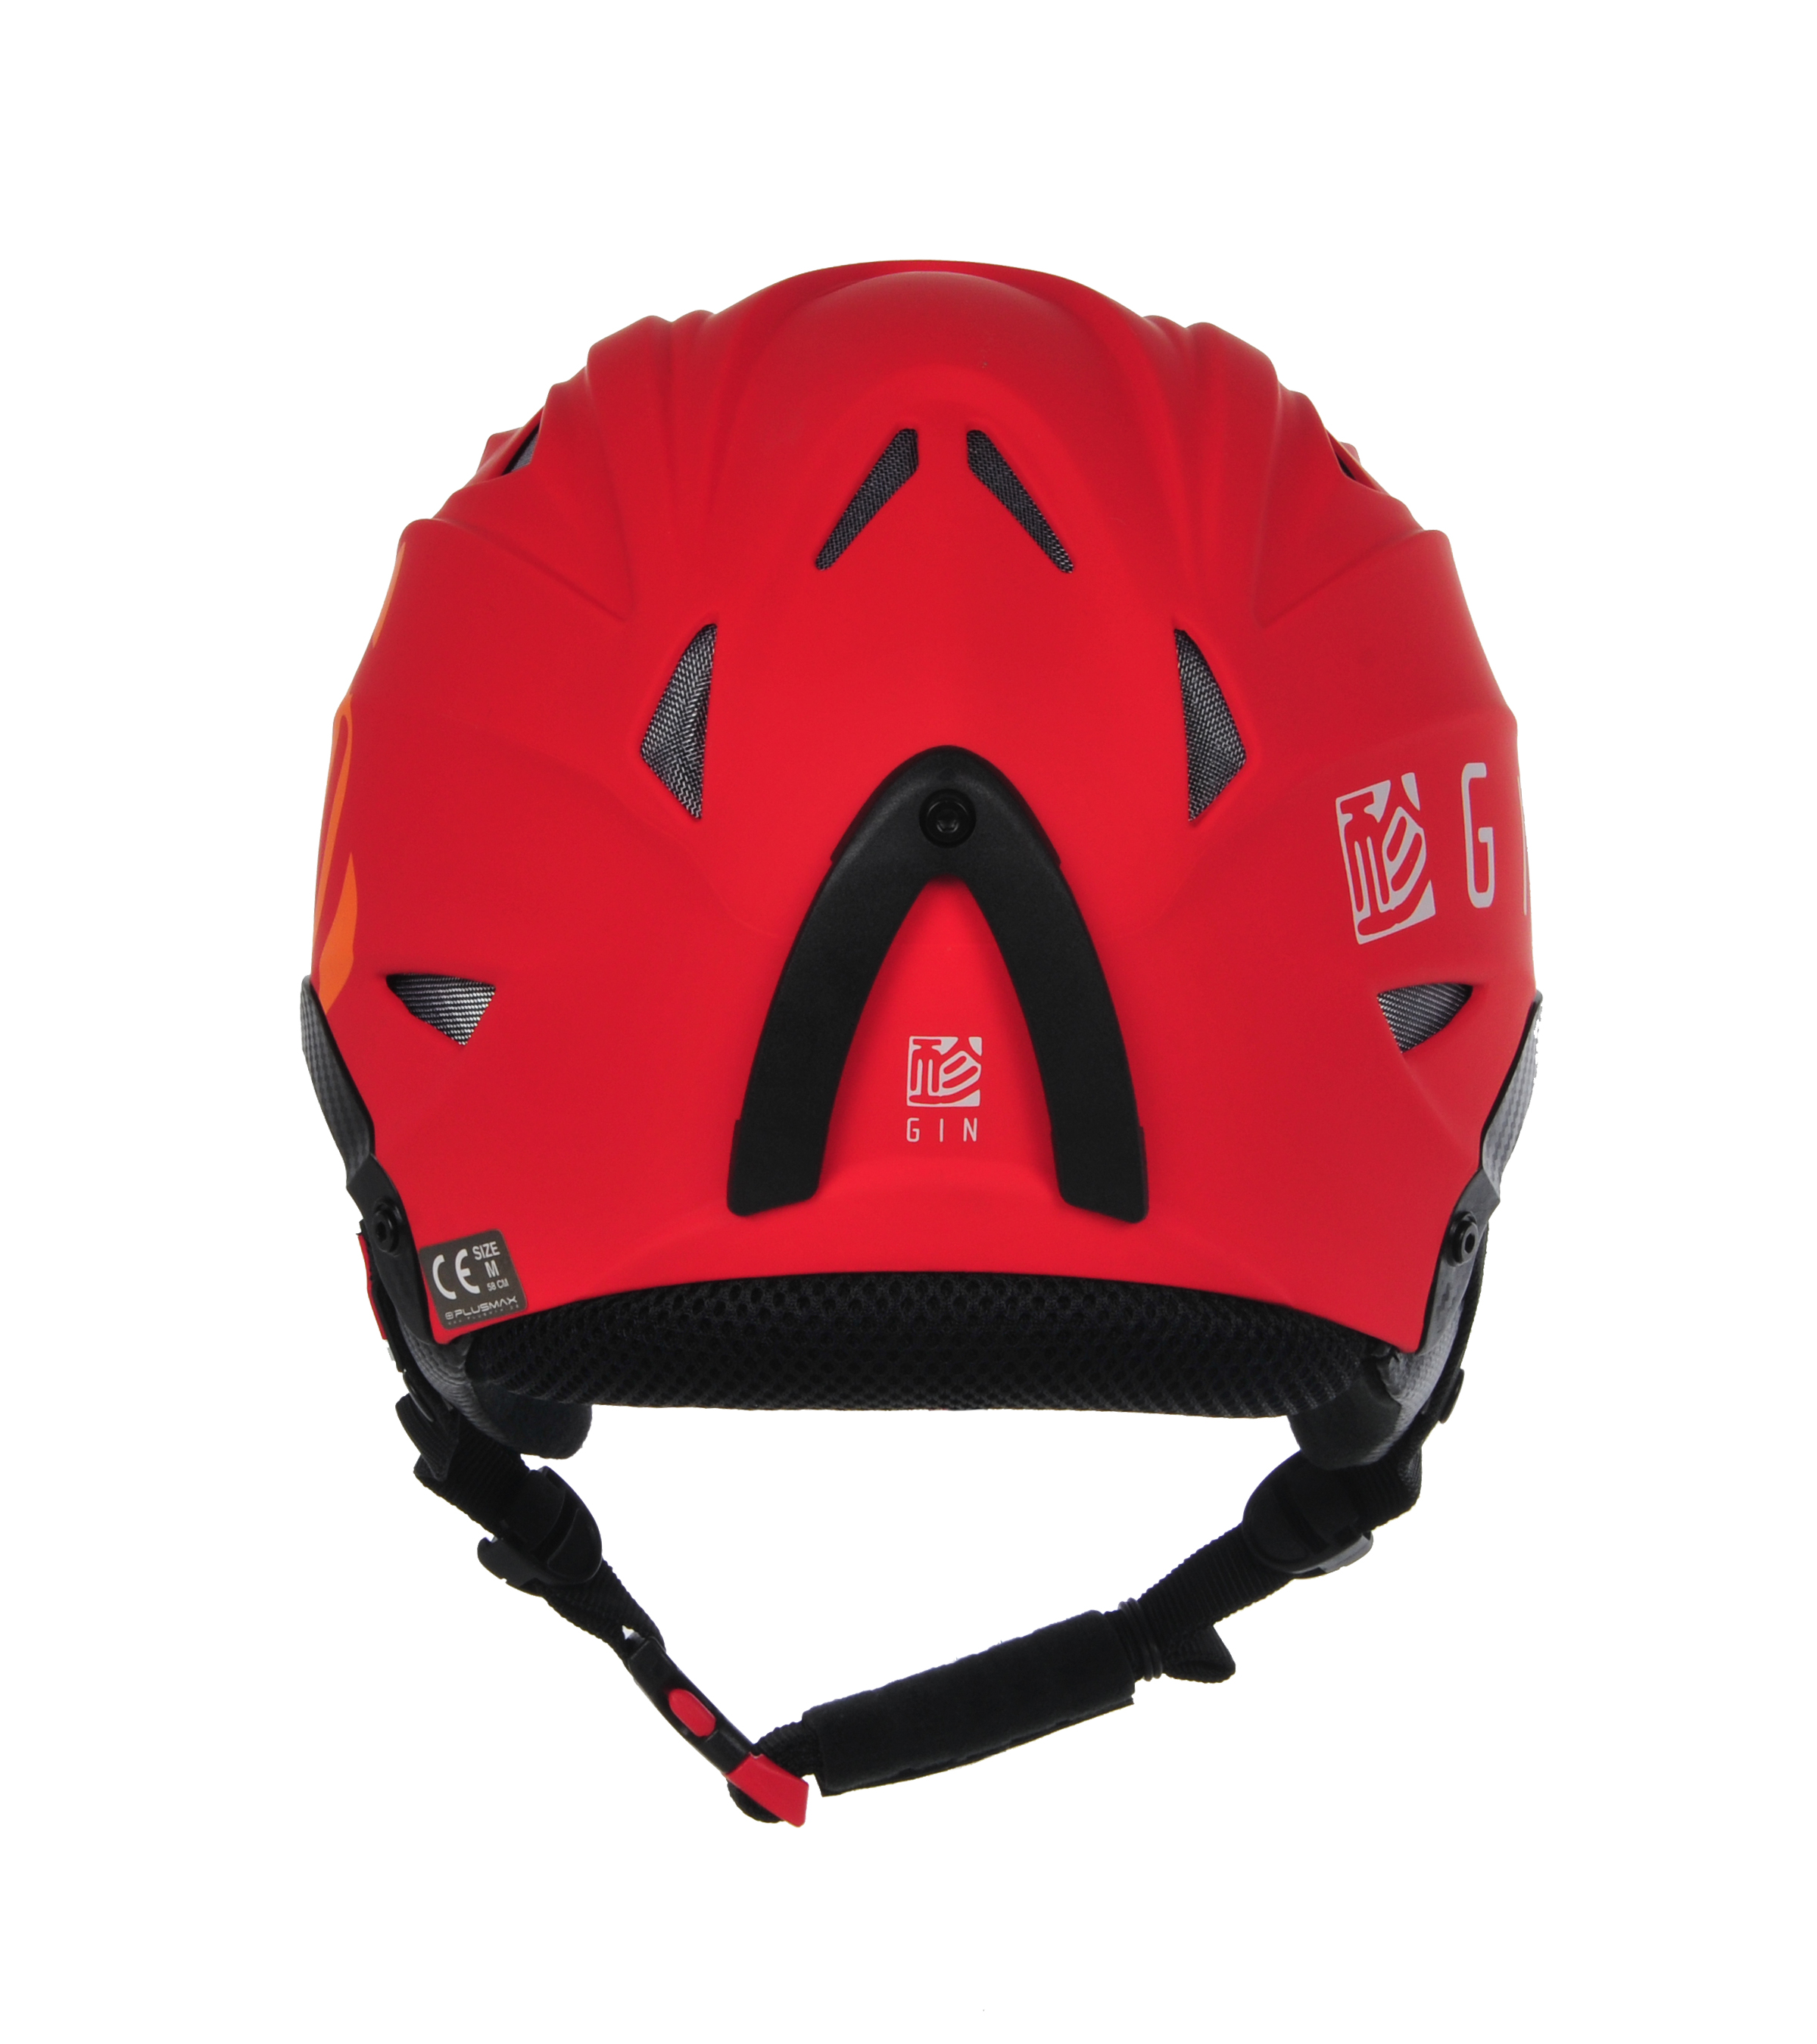 Plusmax helmet gopro |